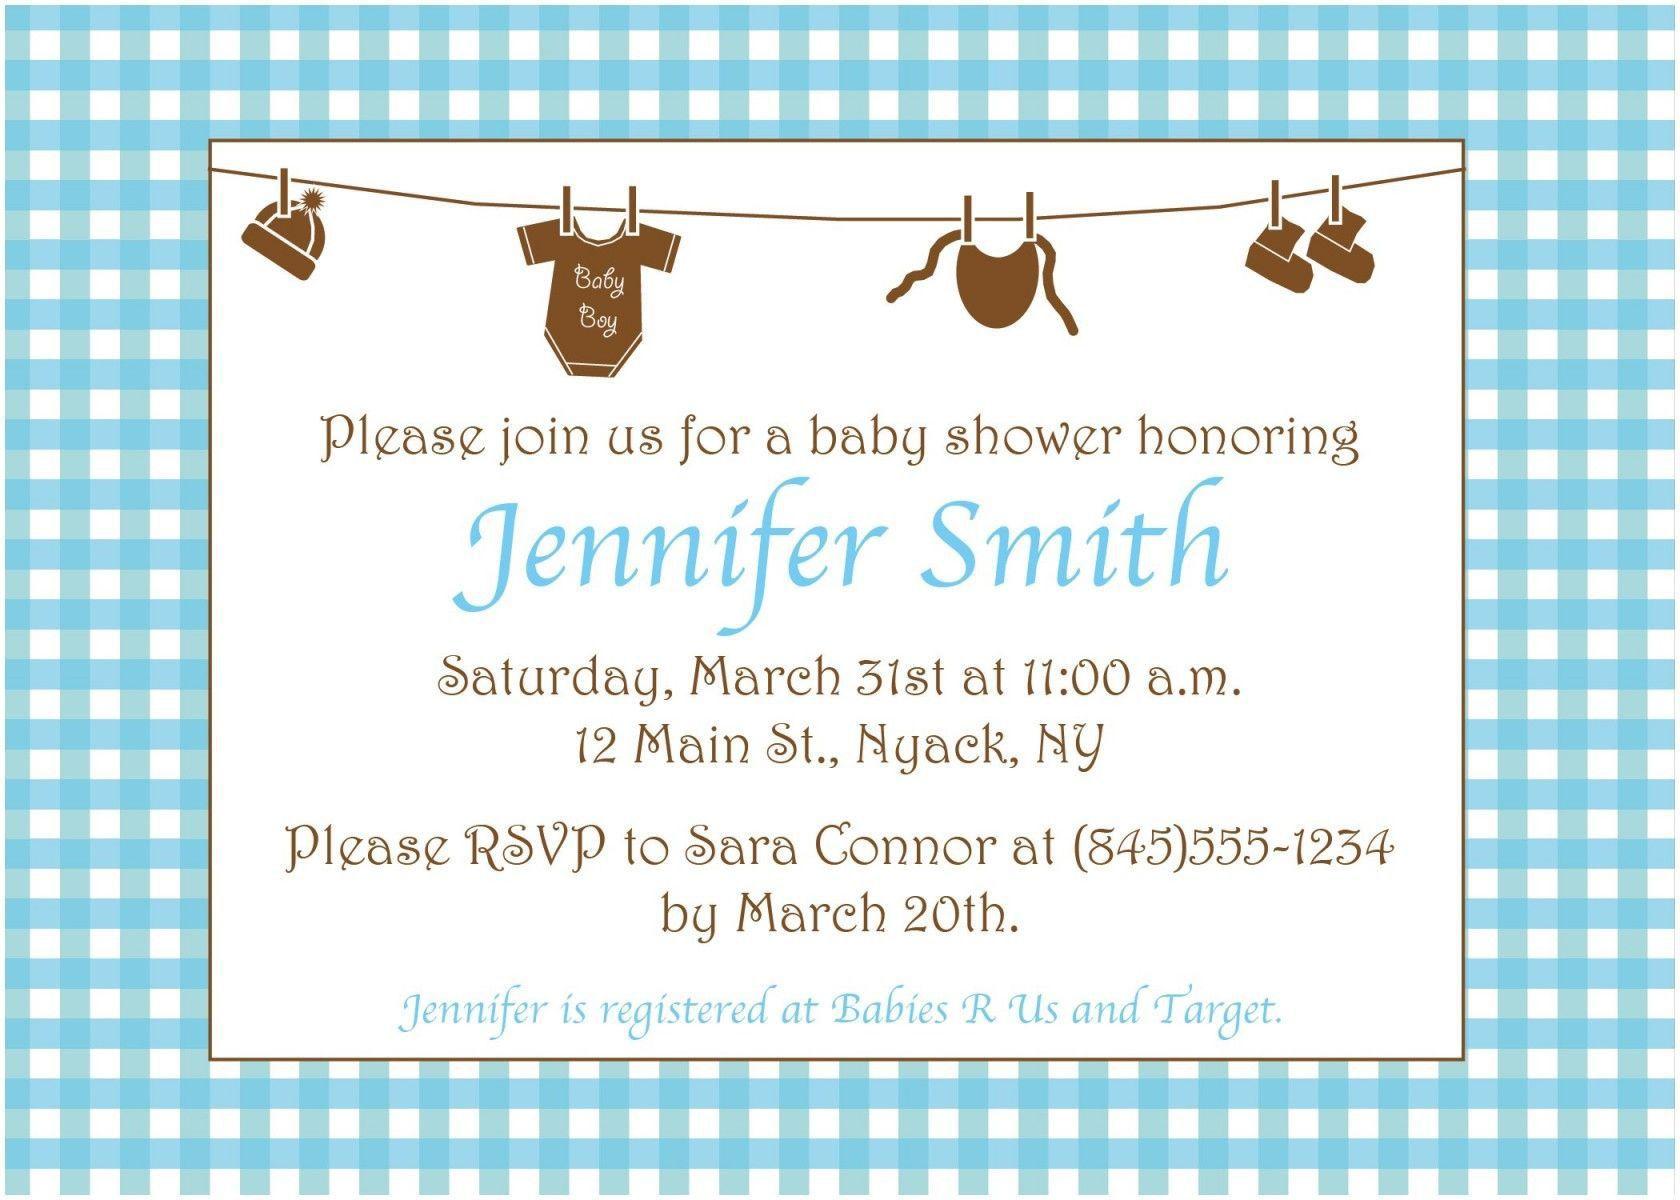 005 Surprising Baby Shower Invitation Wording Example Highest Quality  Examples Invite Coed Idea For BoyFull